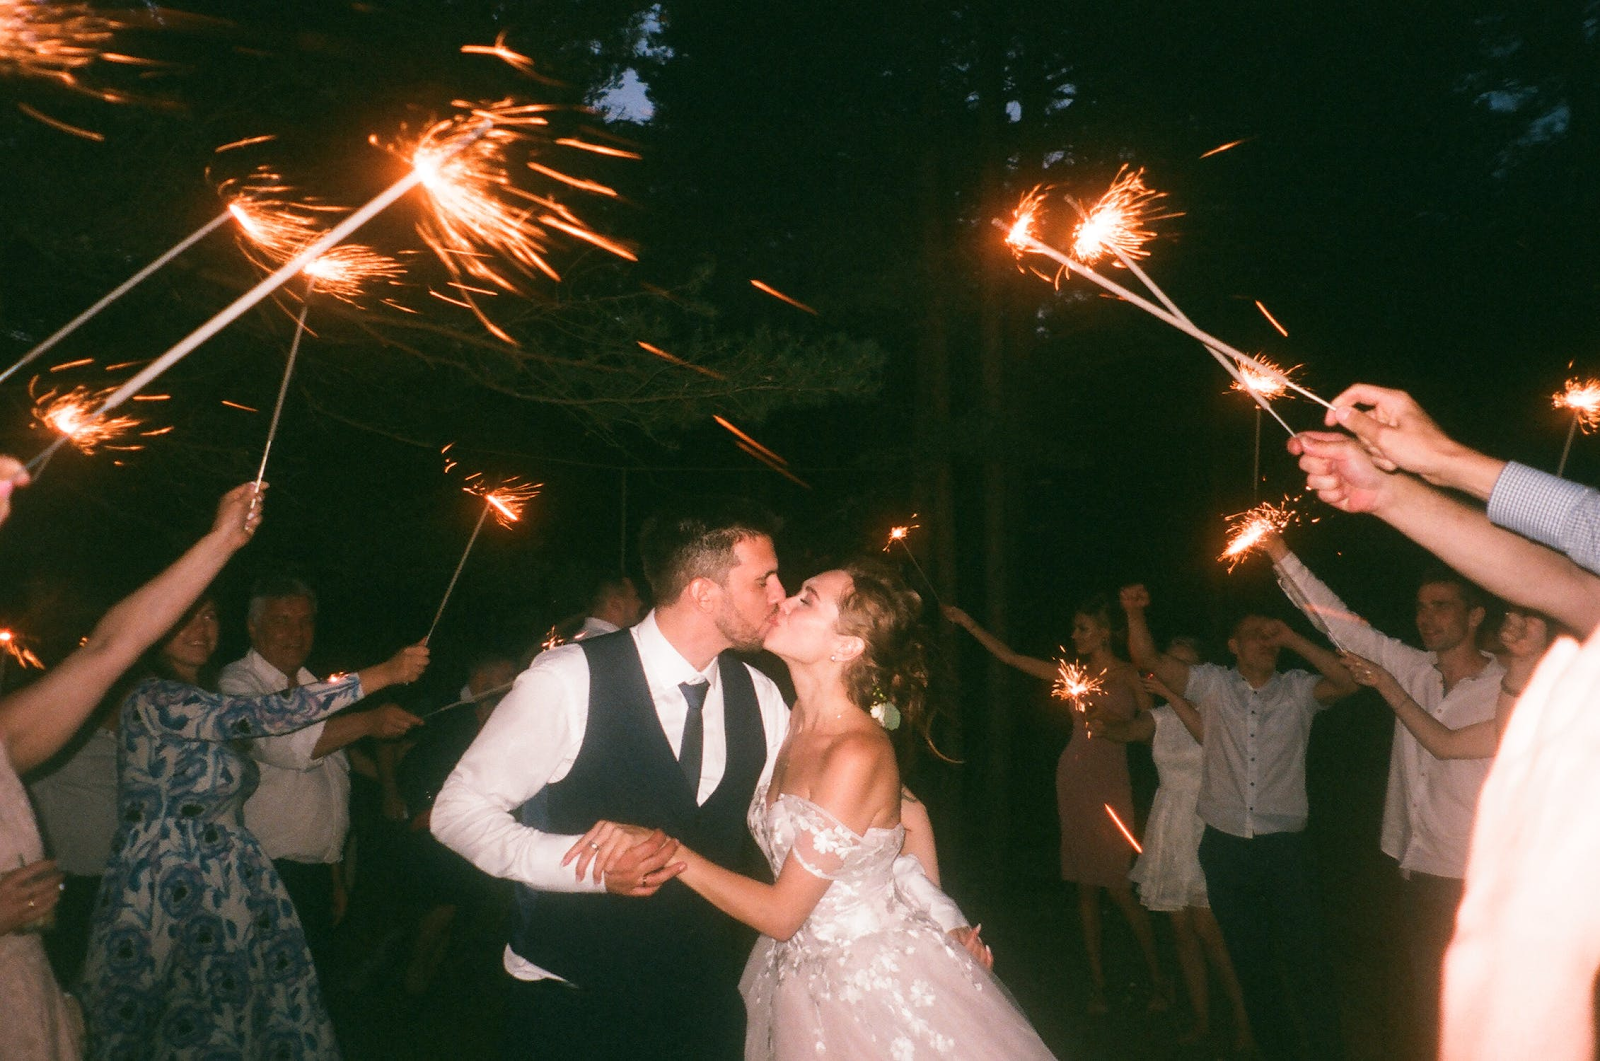 A wedding celebration with music.